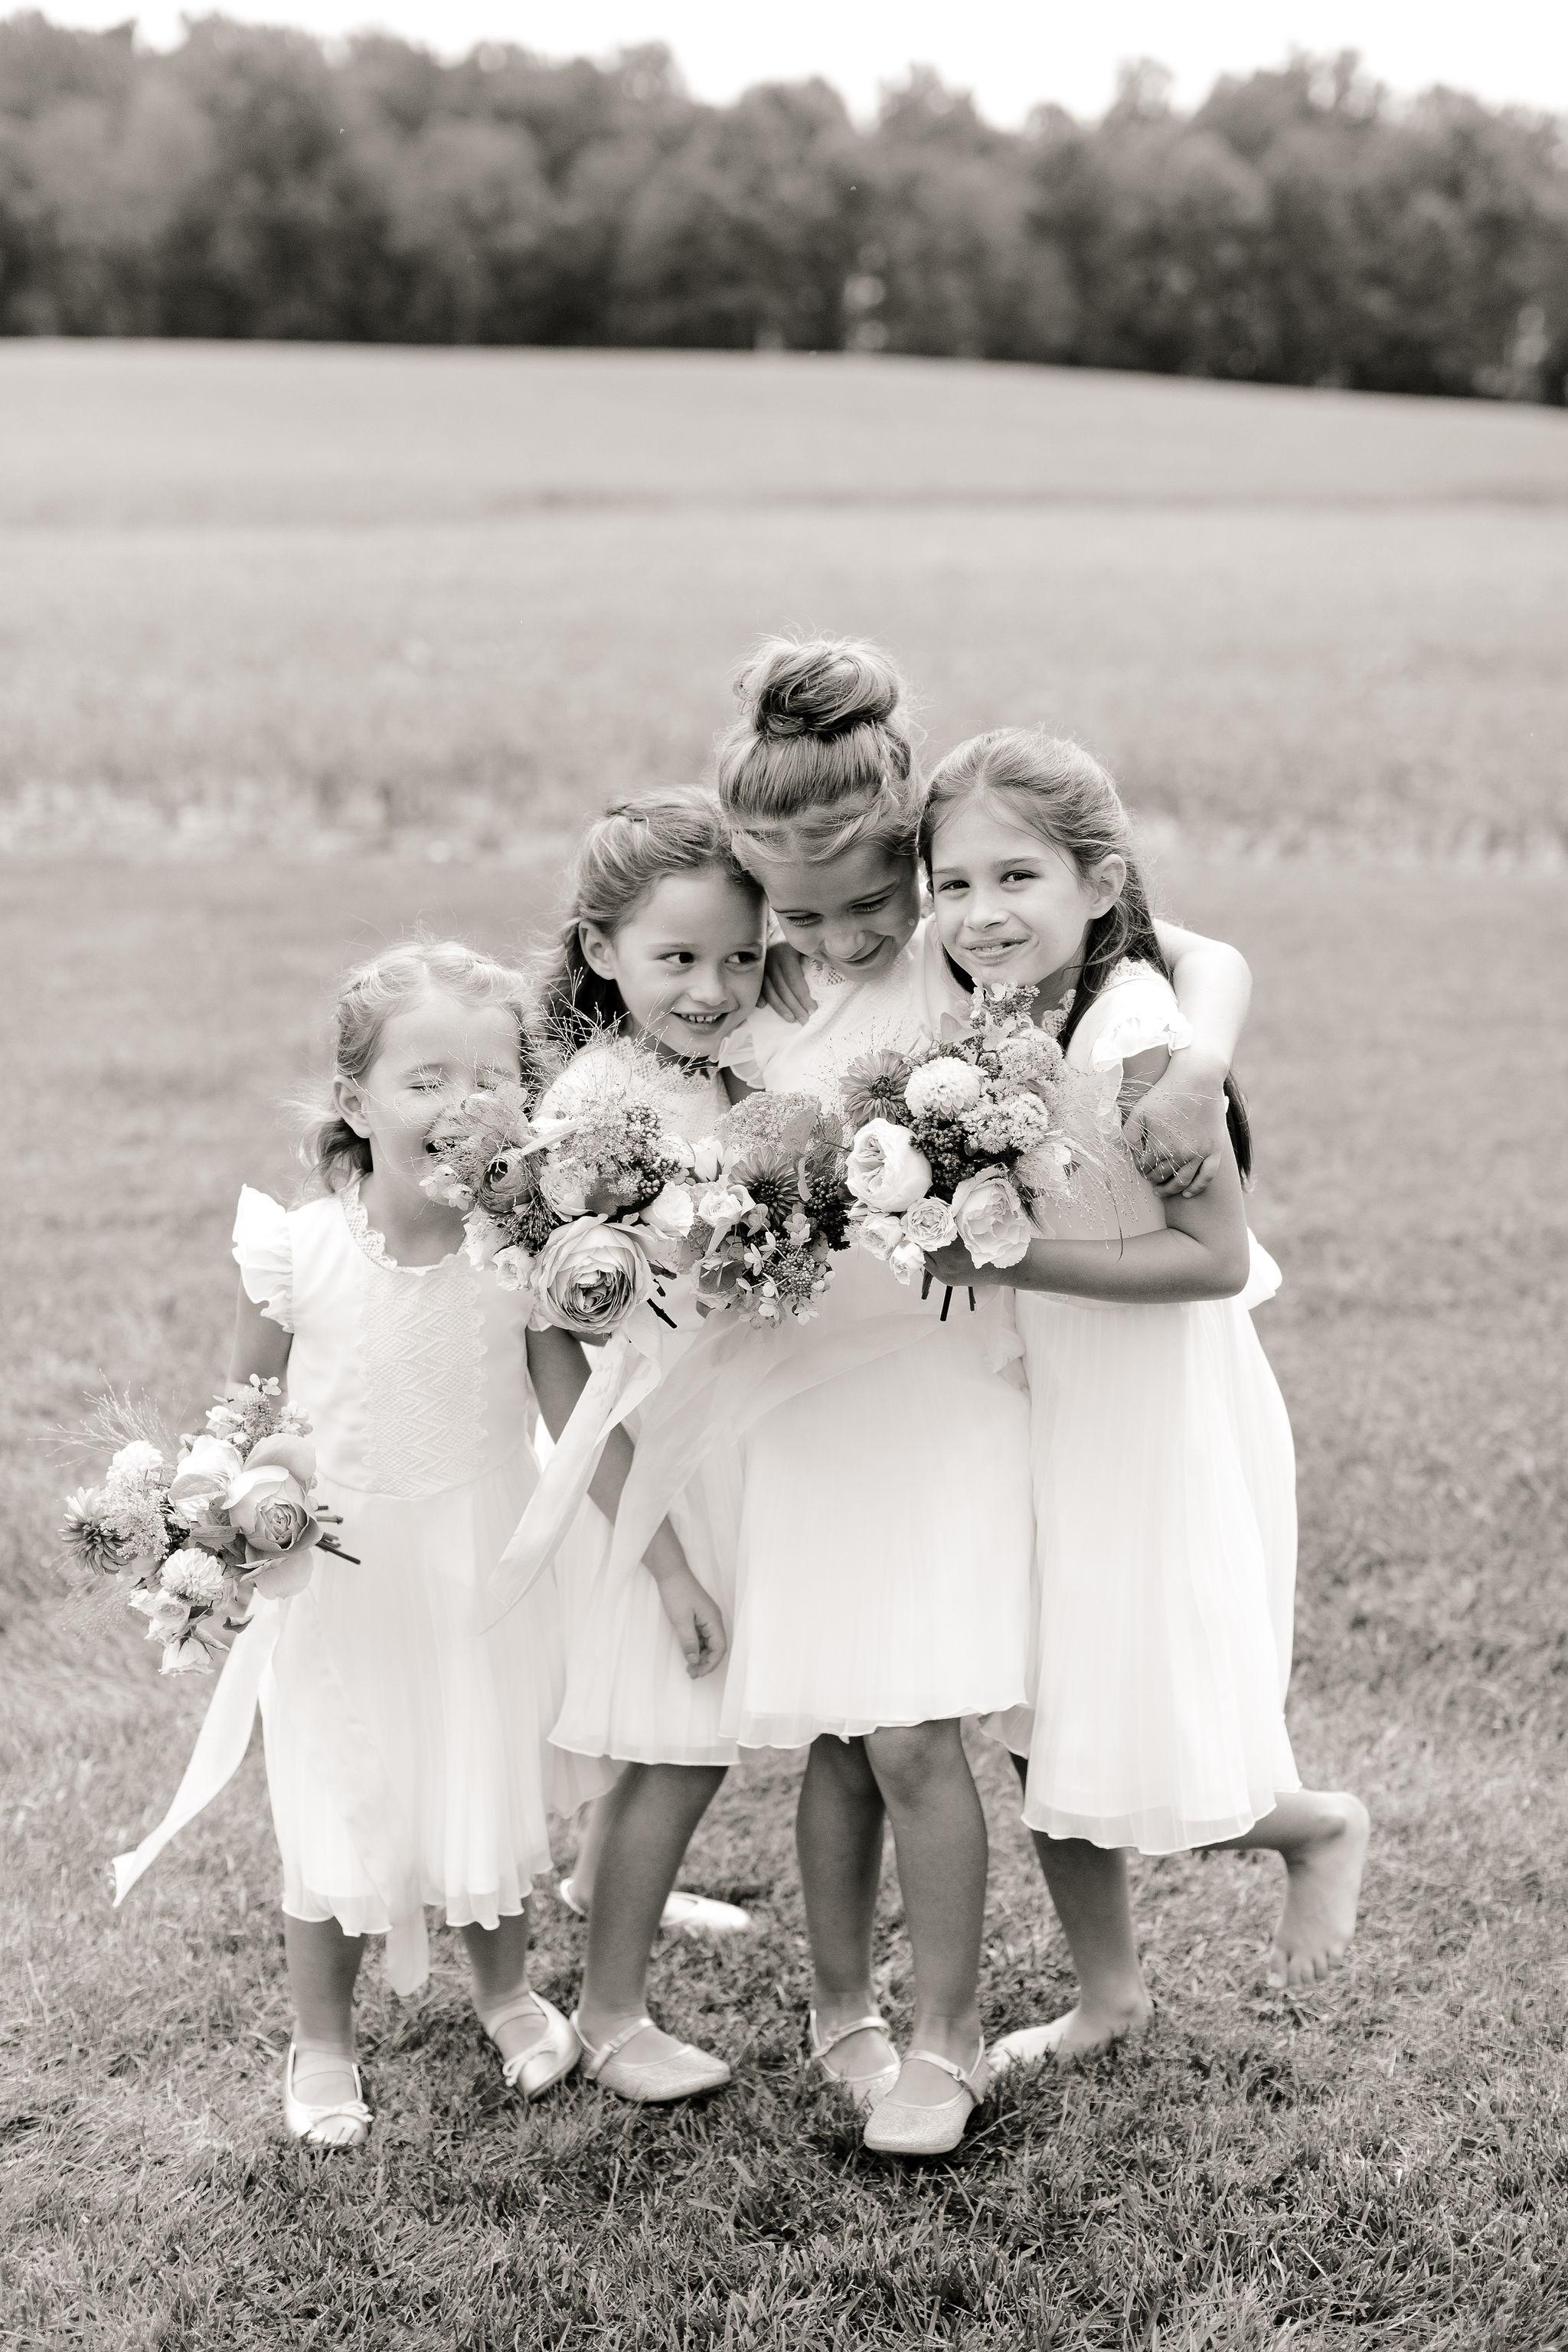 J+C at Private Residence   Fall Wedding   Sophie Felts Floral Design   DC Wedding Florist   MD Wedding Florist  